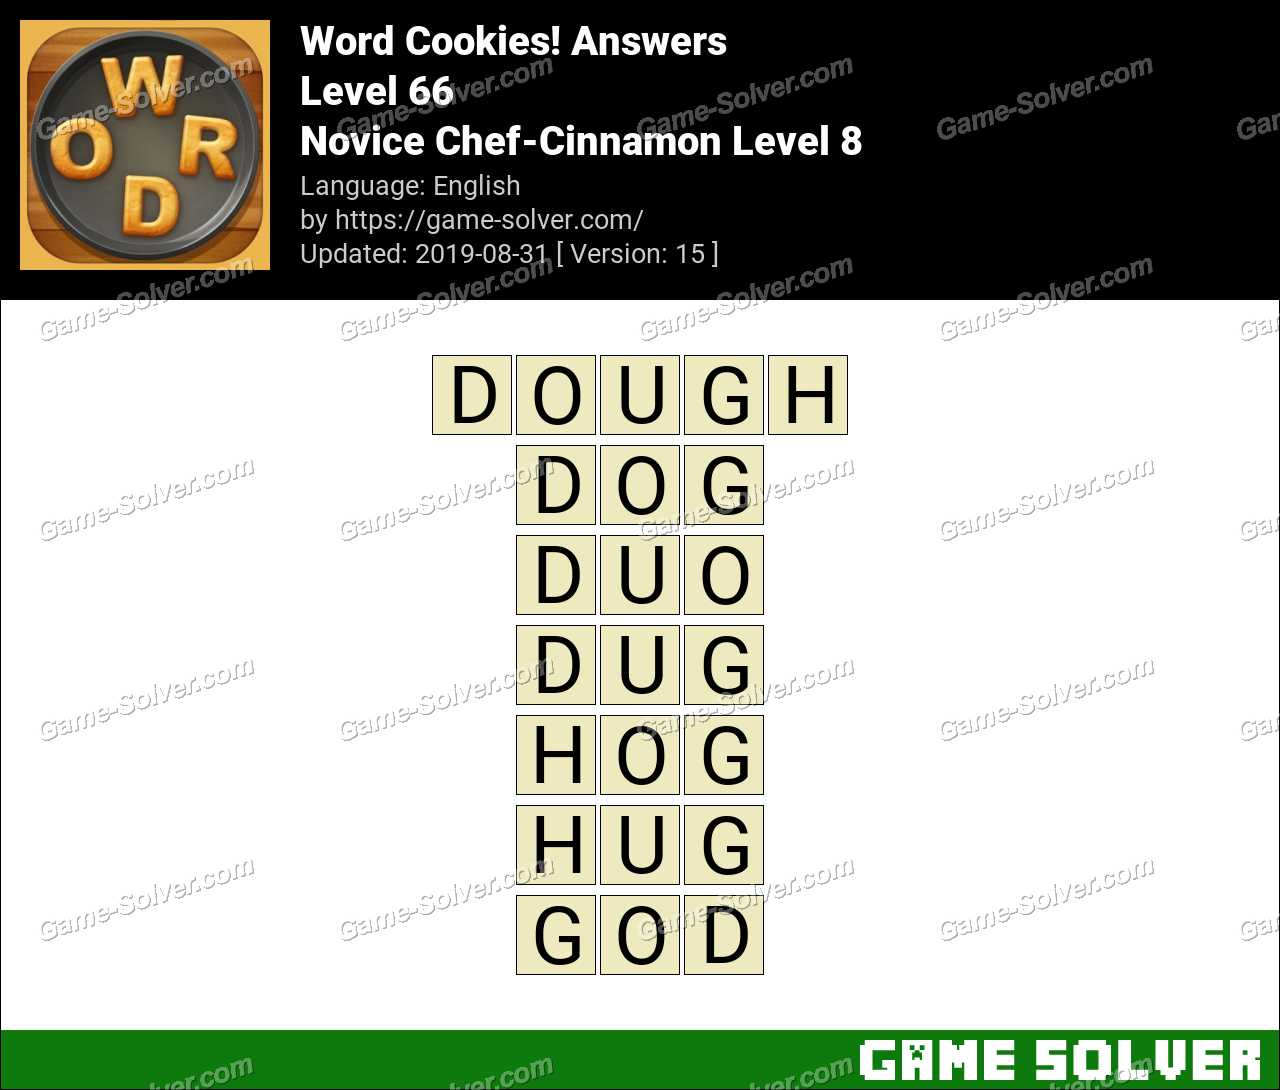 Word Cookies Novice Chef-Cinnamon Level 8 Answers